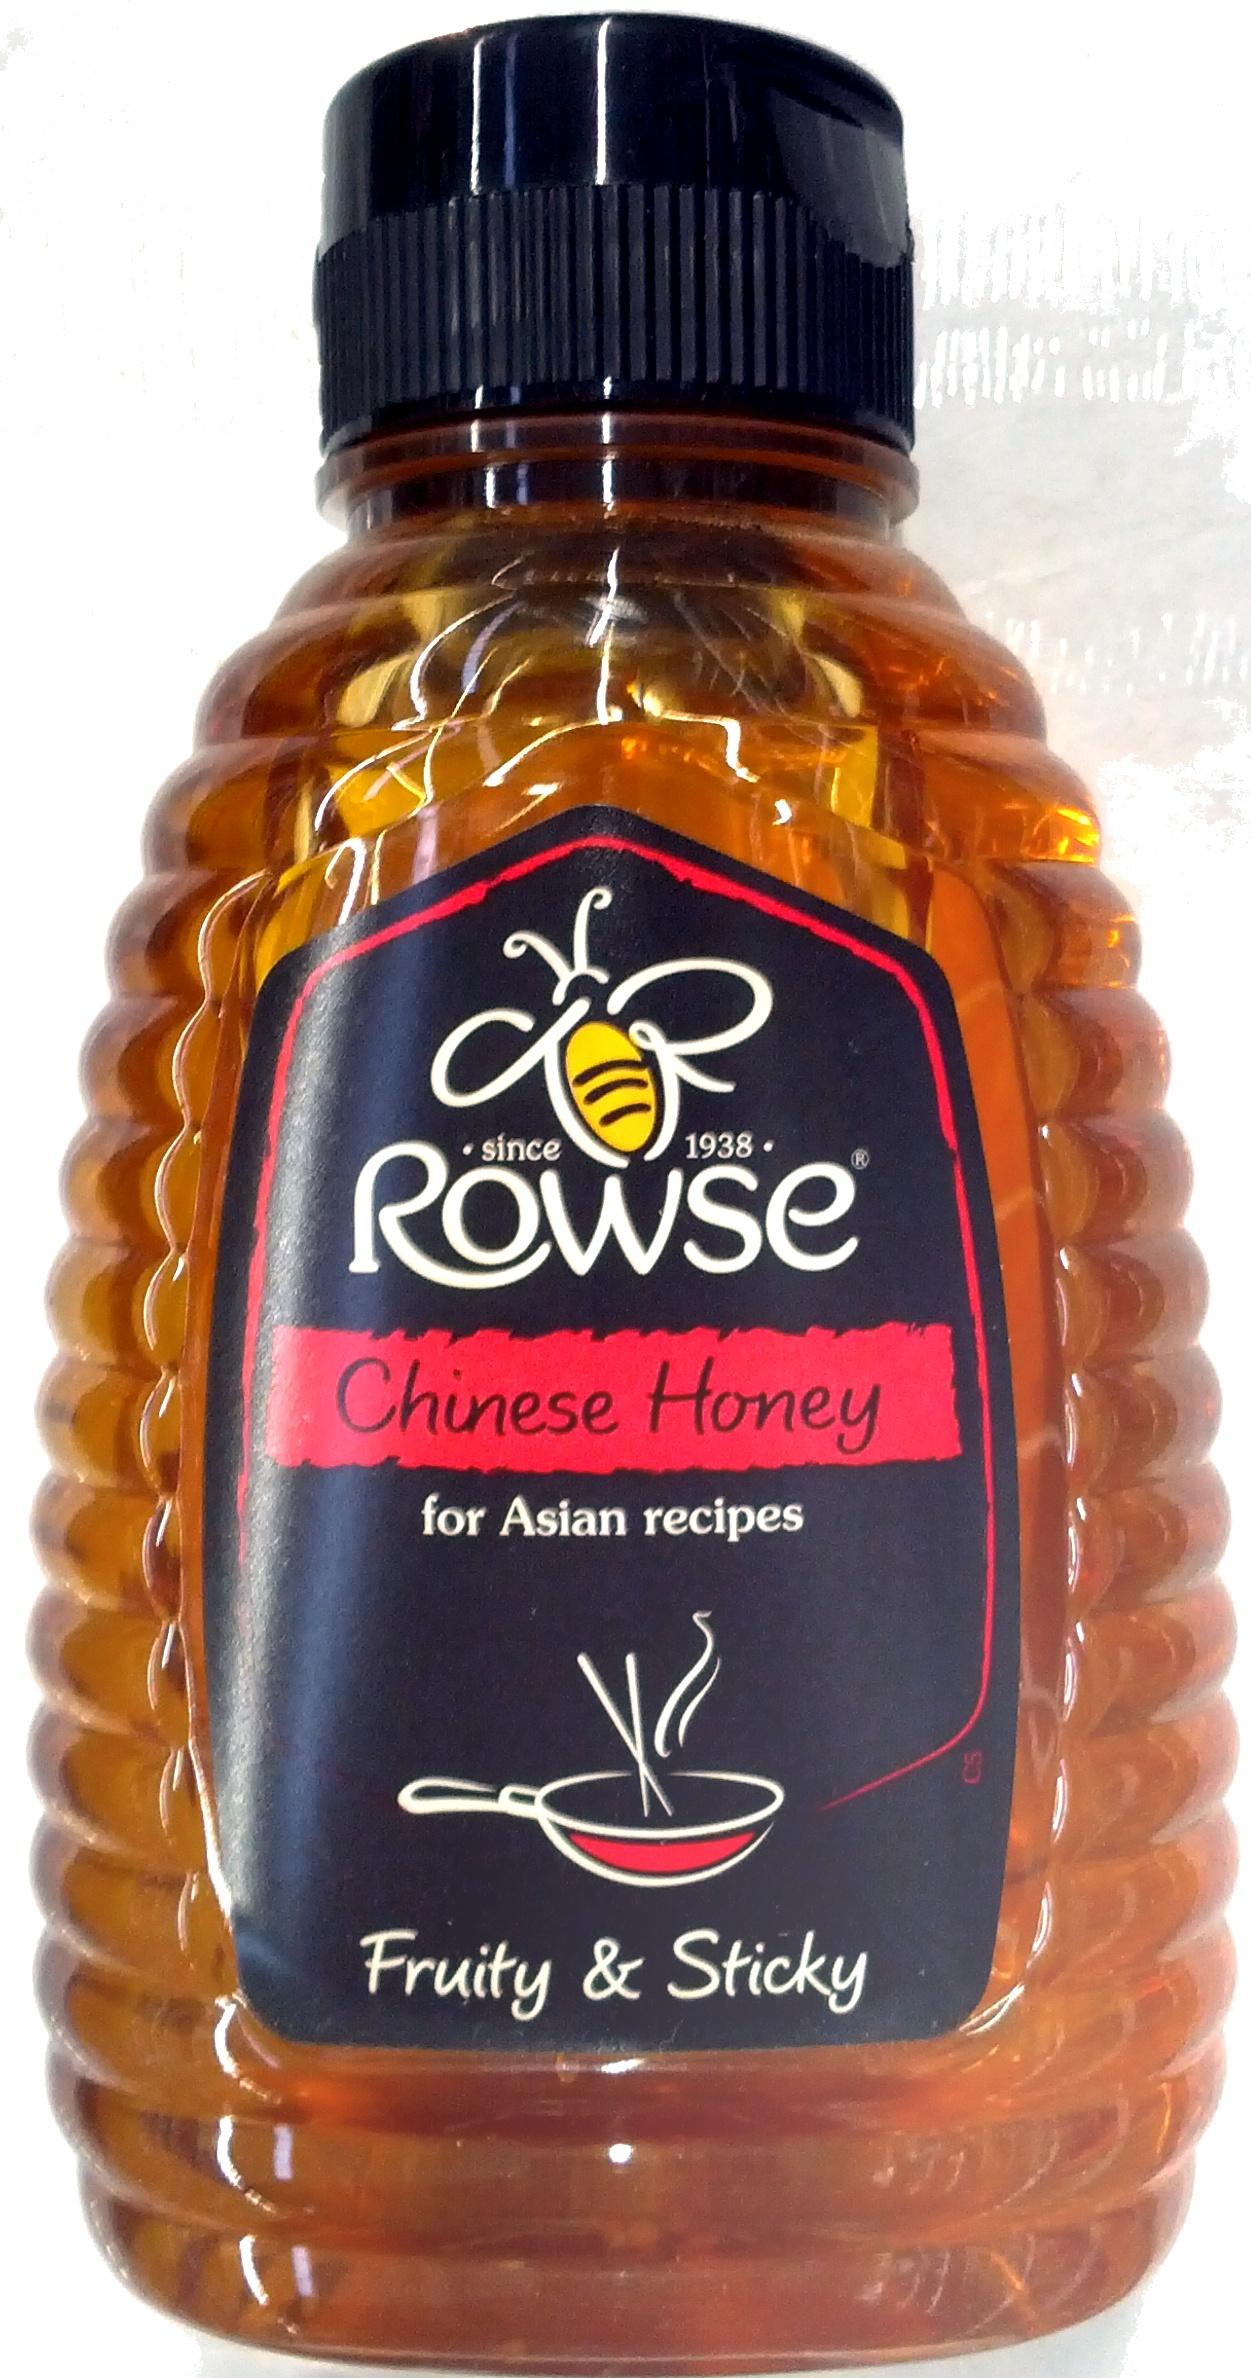 Chinese Honey - Product - en